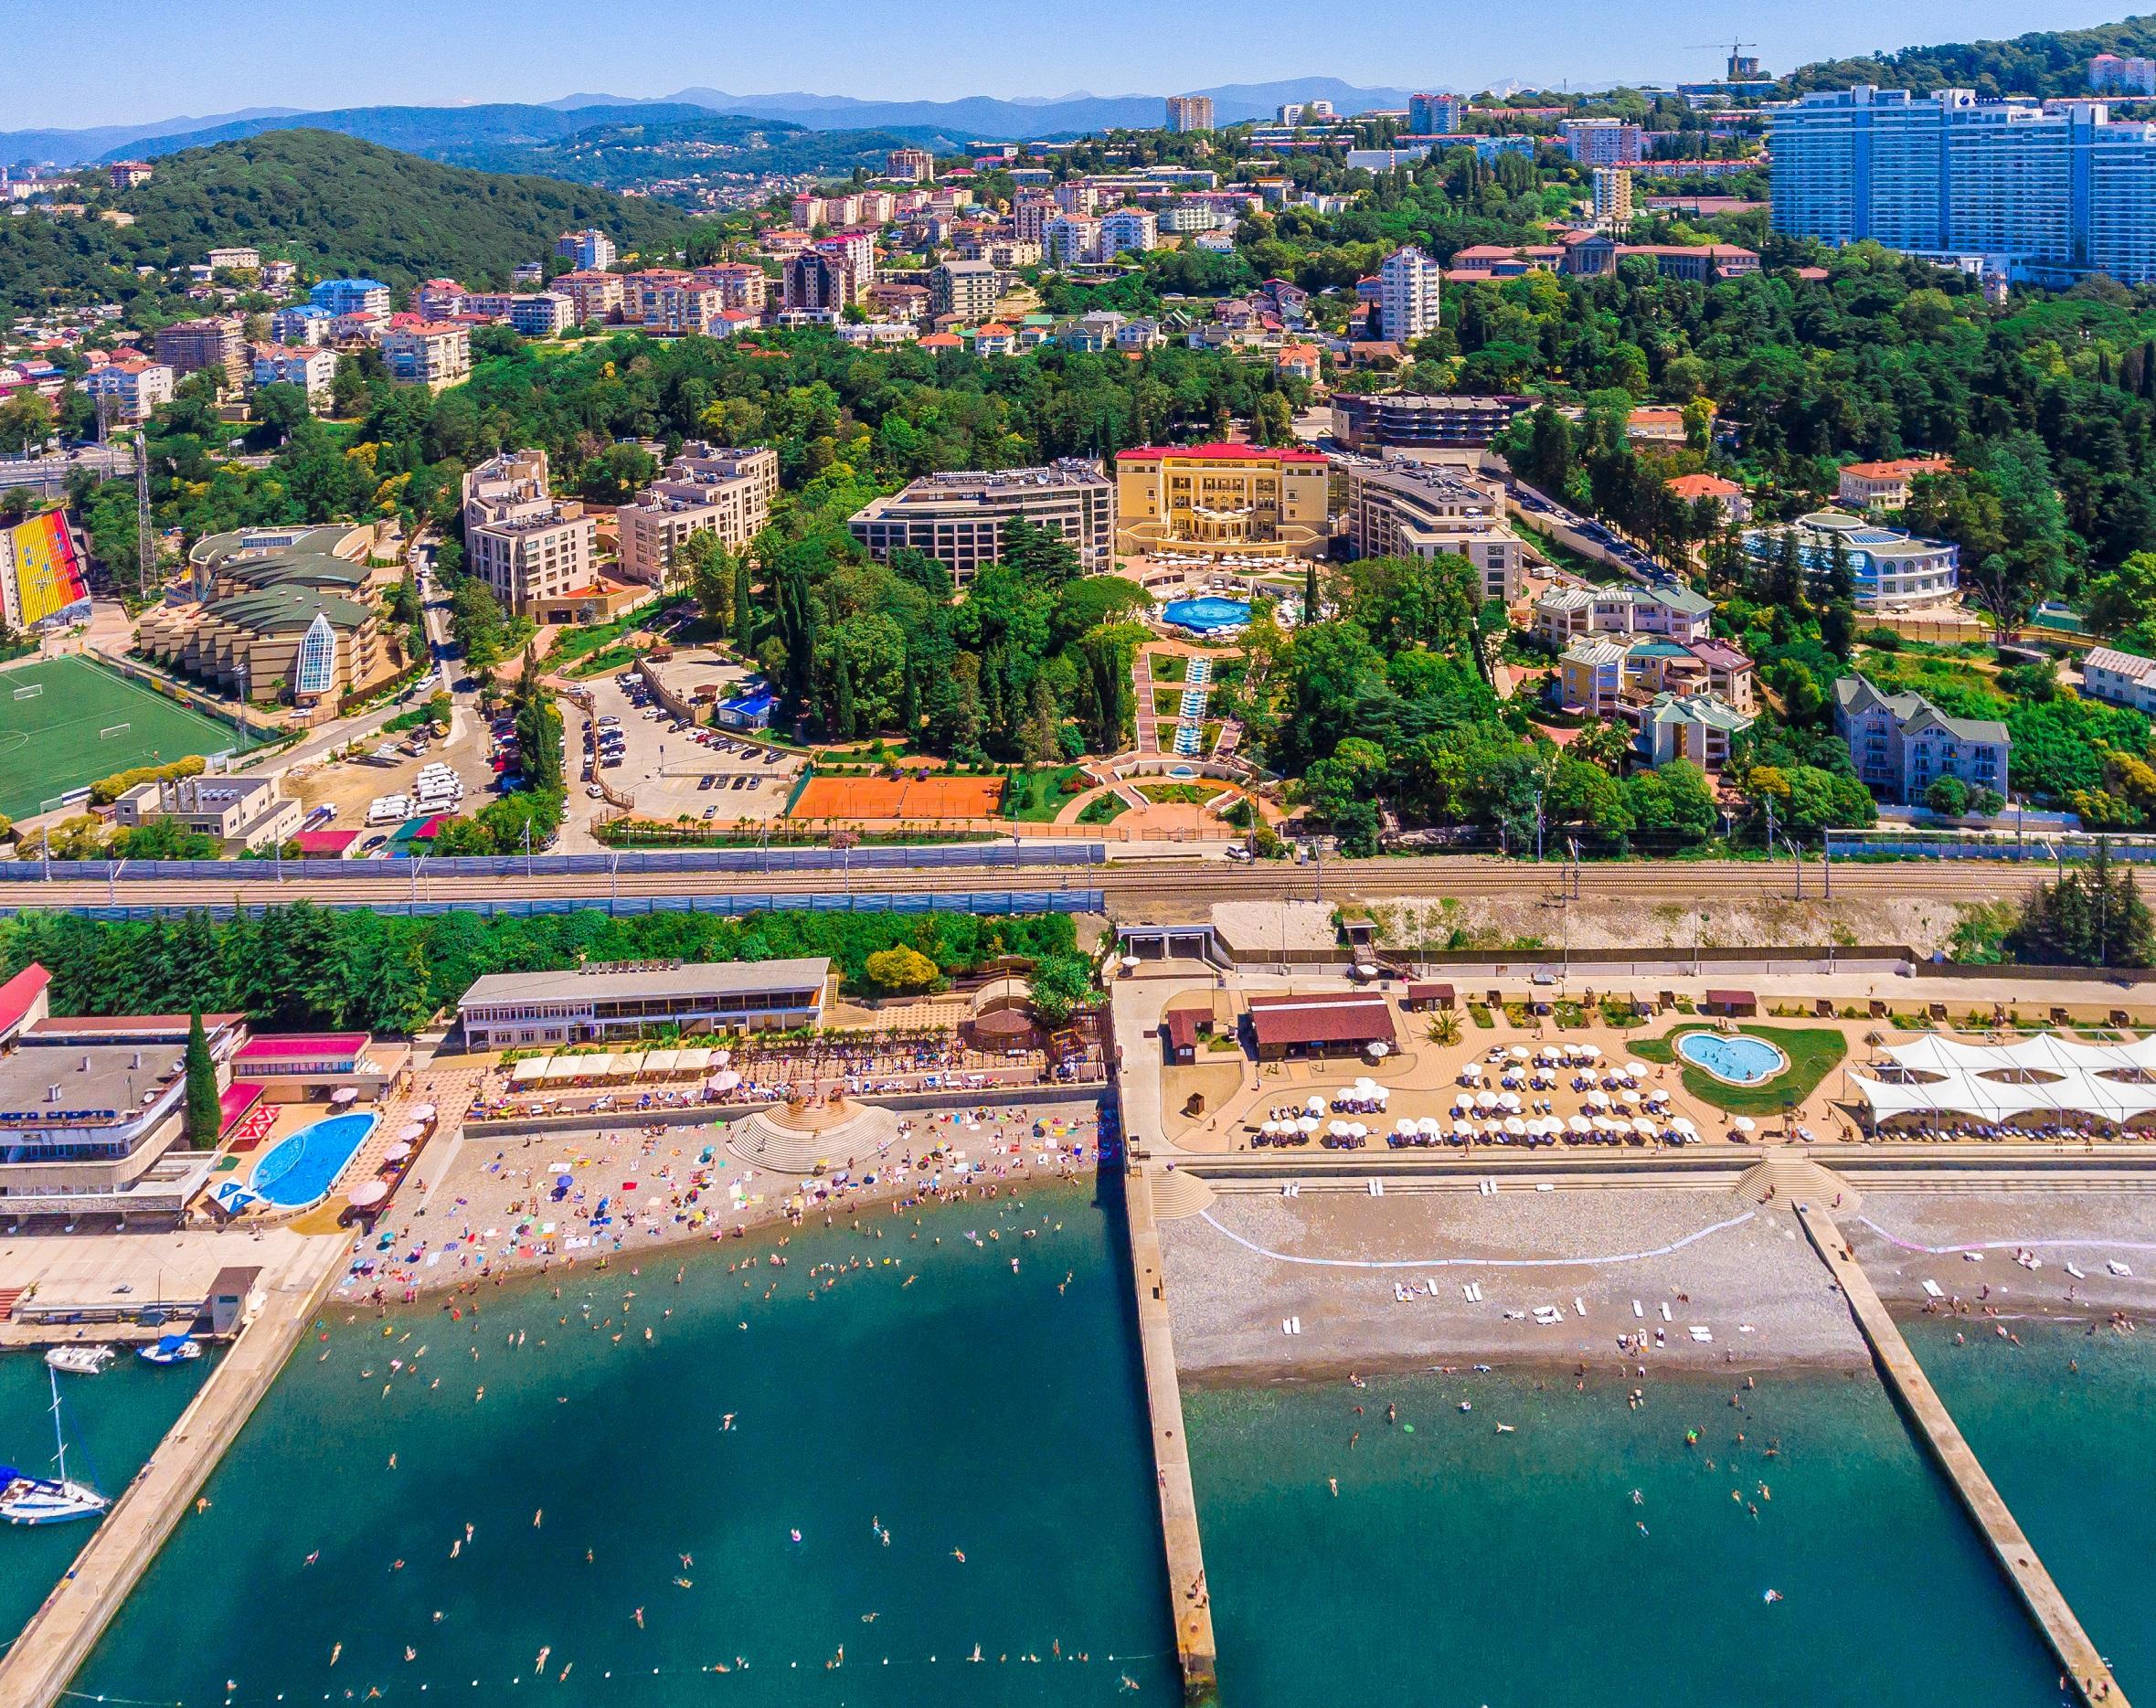 Гостиница Swissotel Resort Sochi Kamelia,Внешний вид (сверху)